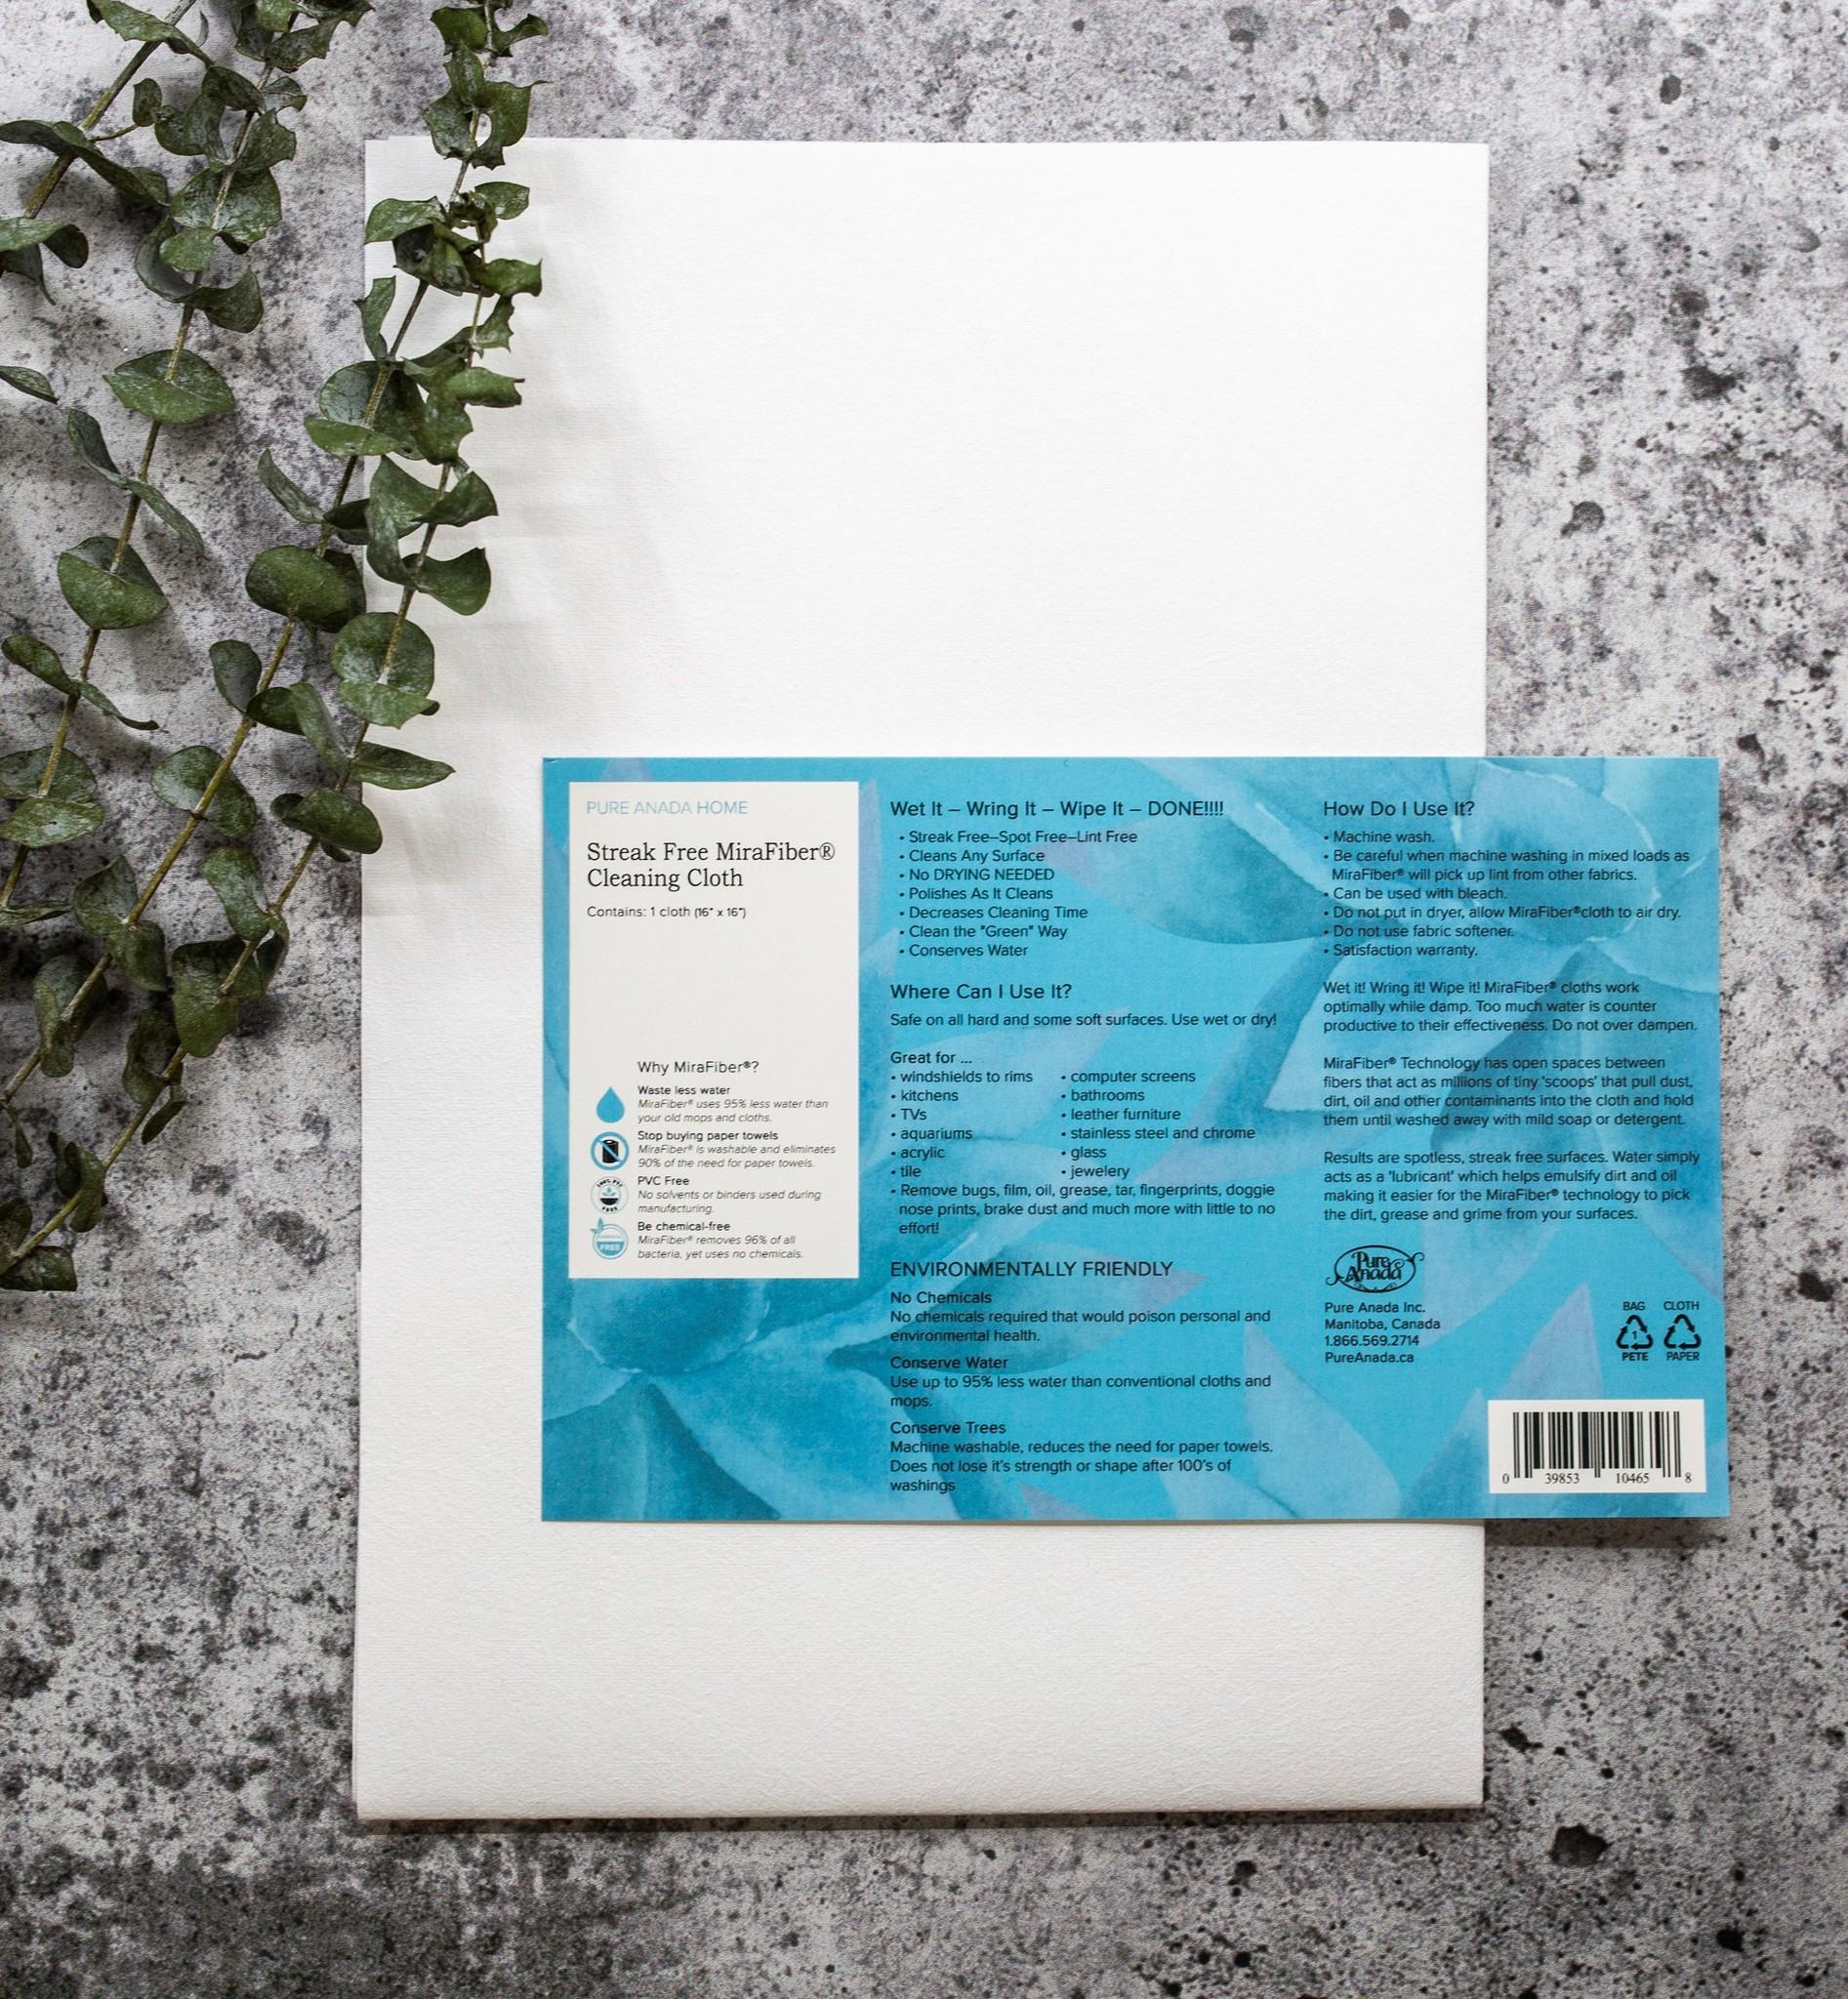 Streak Free MiraFiber Cleaning Cloth-1